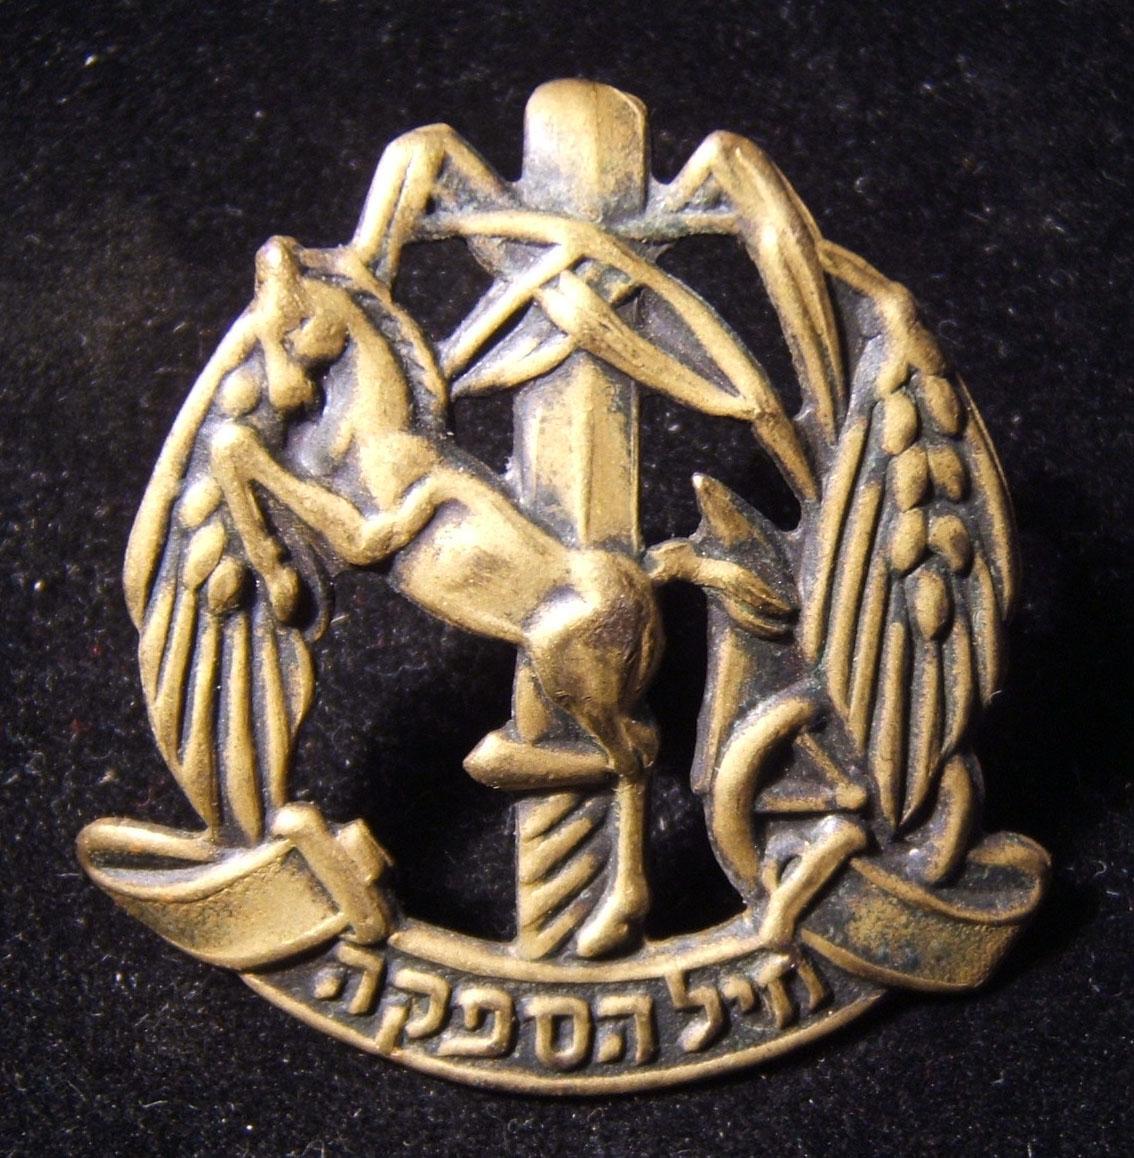 Lot 50197LA - Militaria > Israeli militaria  -  Historama Historama Autumn Mail Auction #5